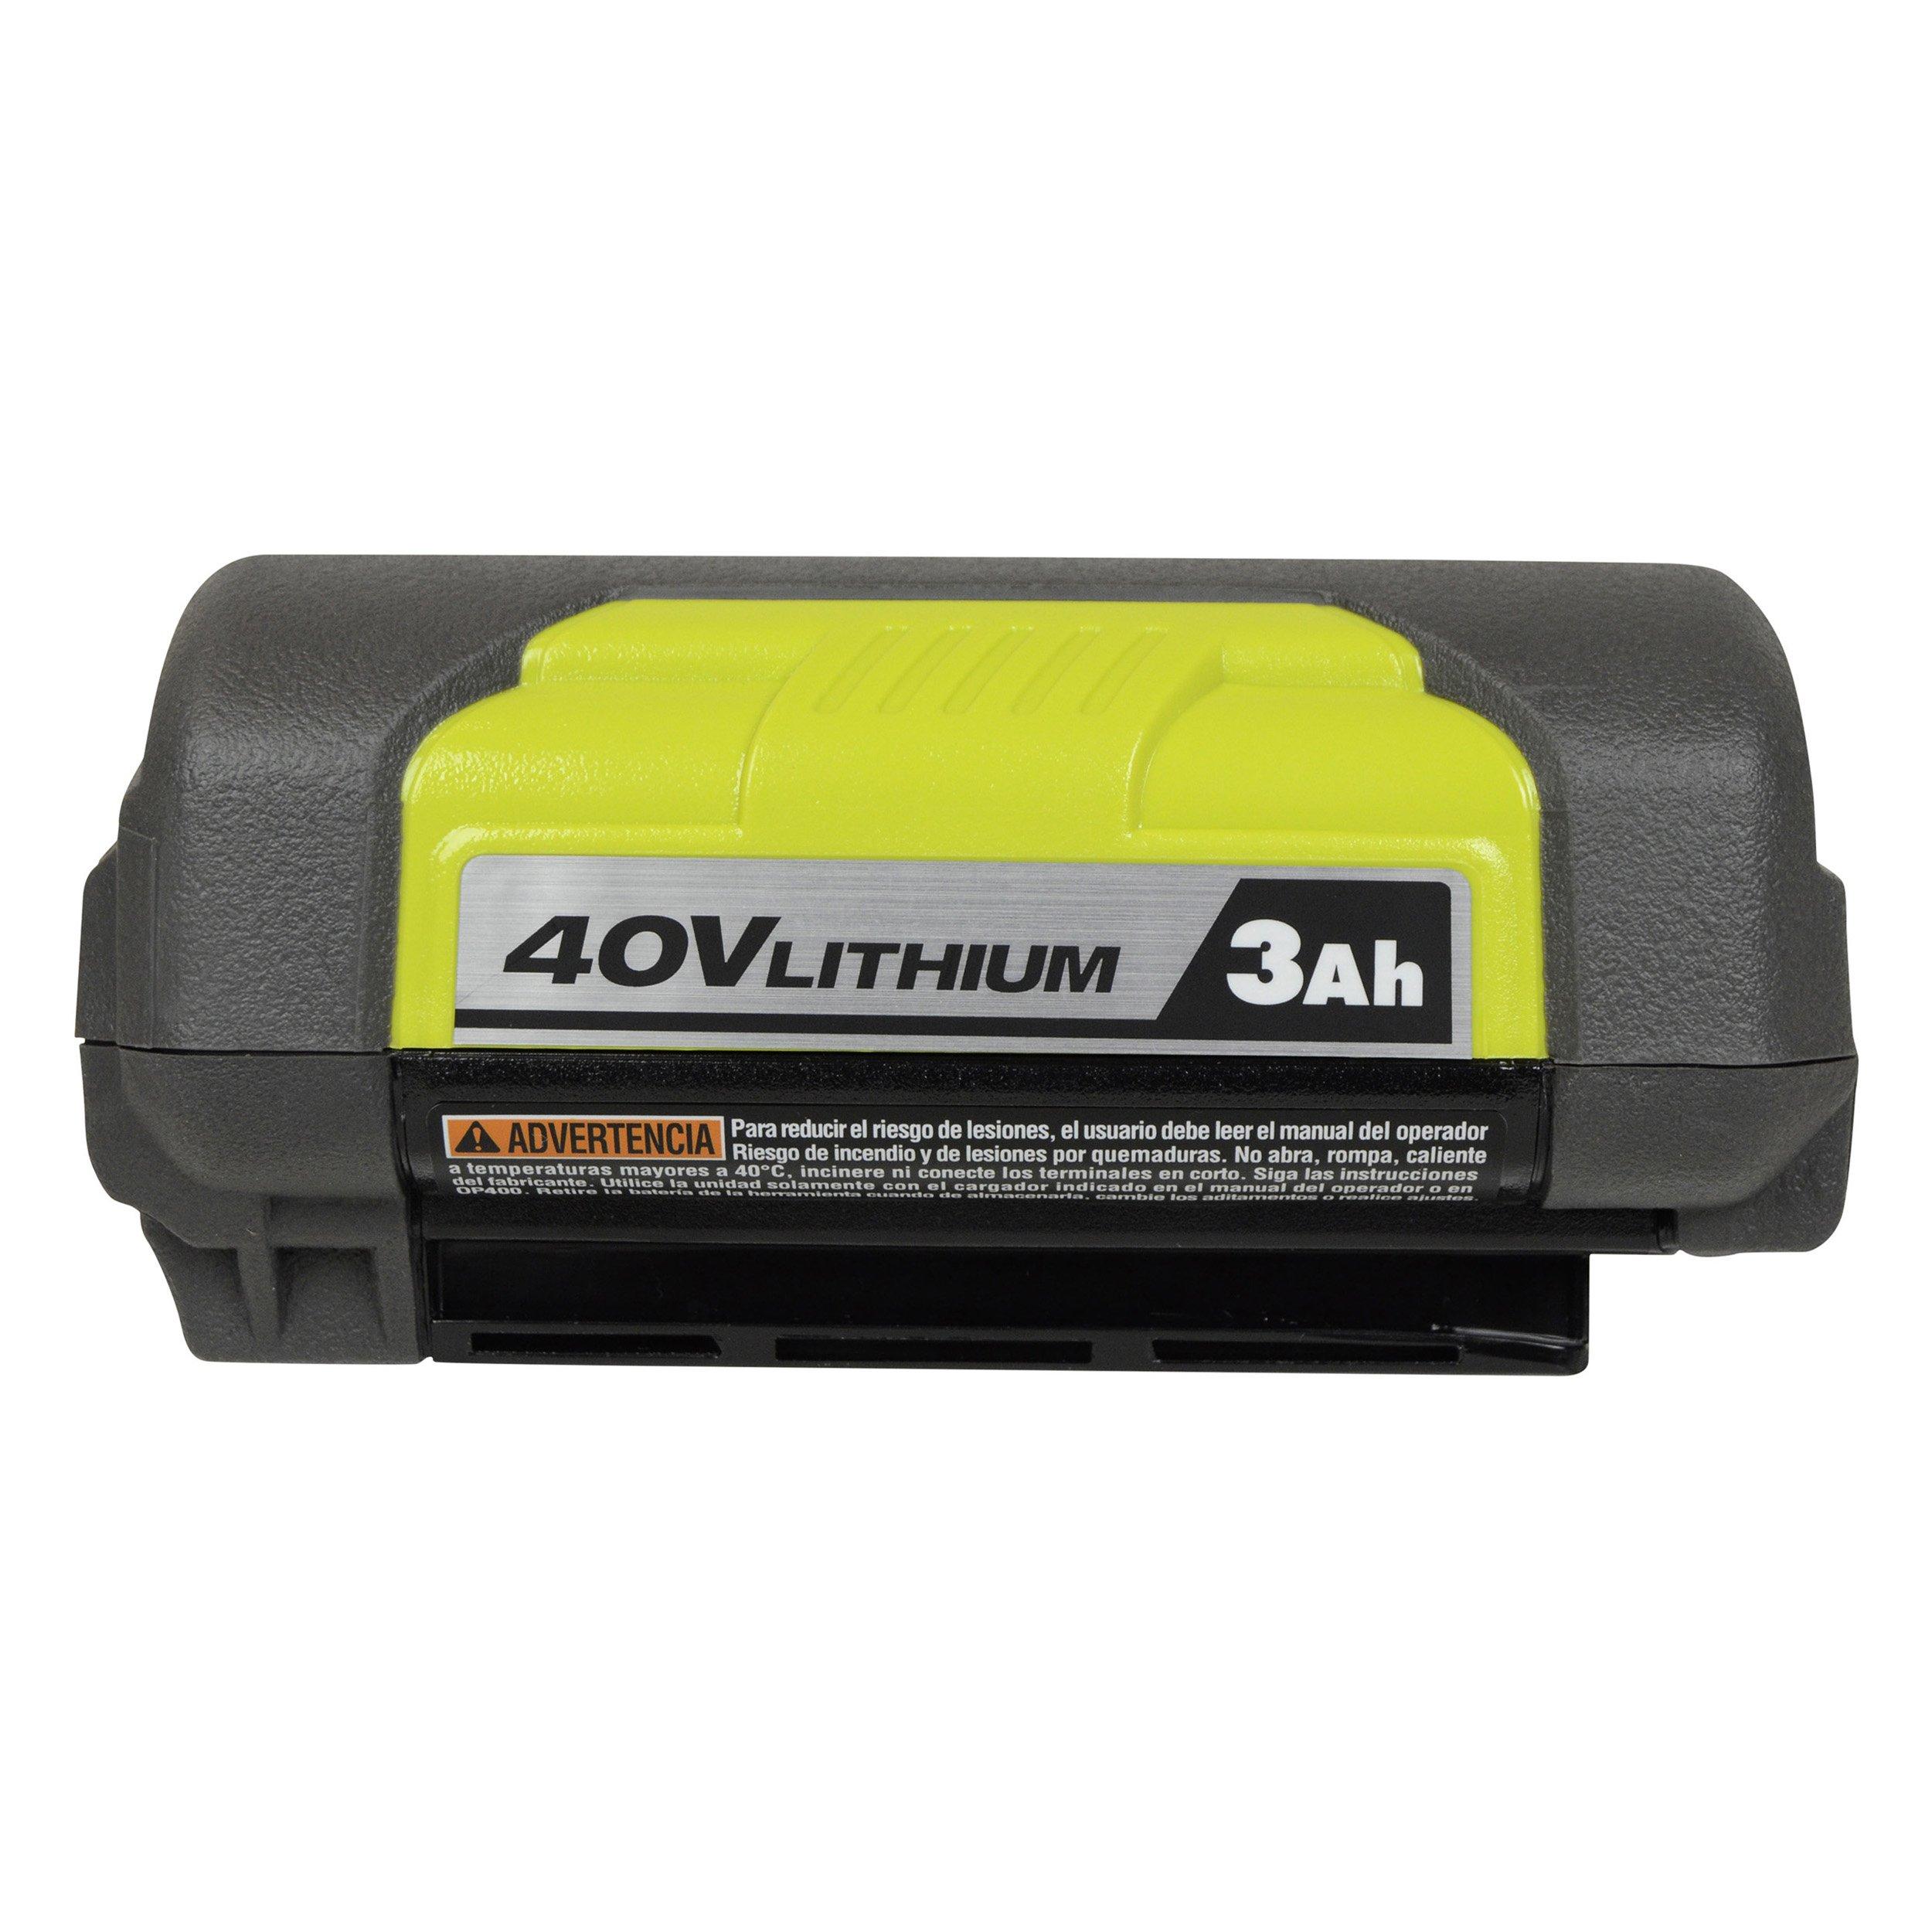 Ryobi OP4030 40V 3.0Ah Lithium ion Battery w/ Fuel Gauge by Ryobi (Image #3)